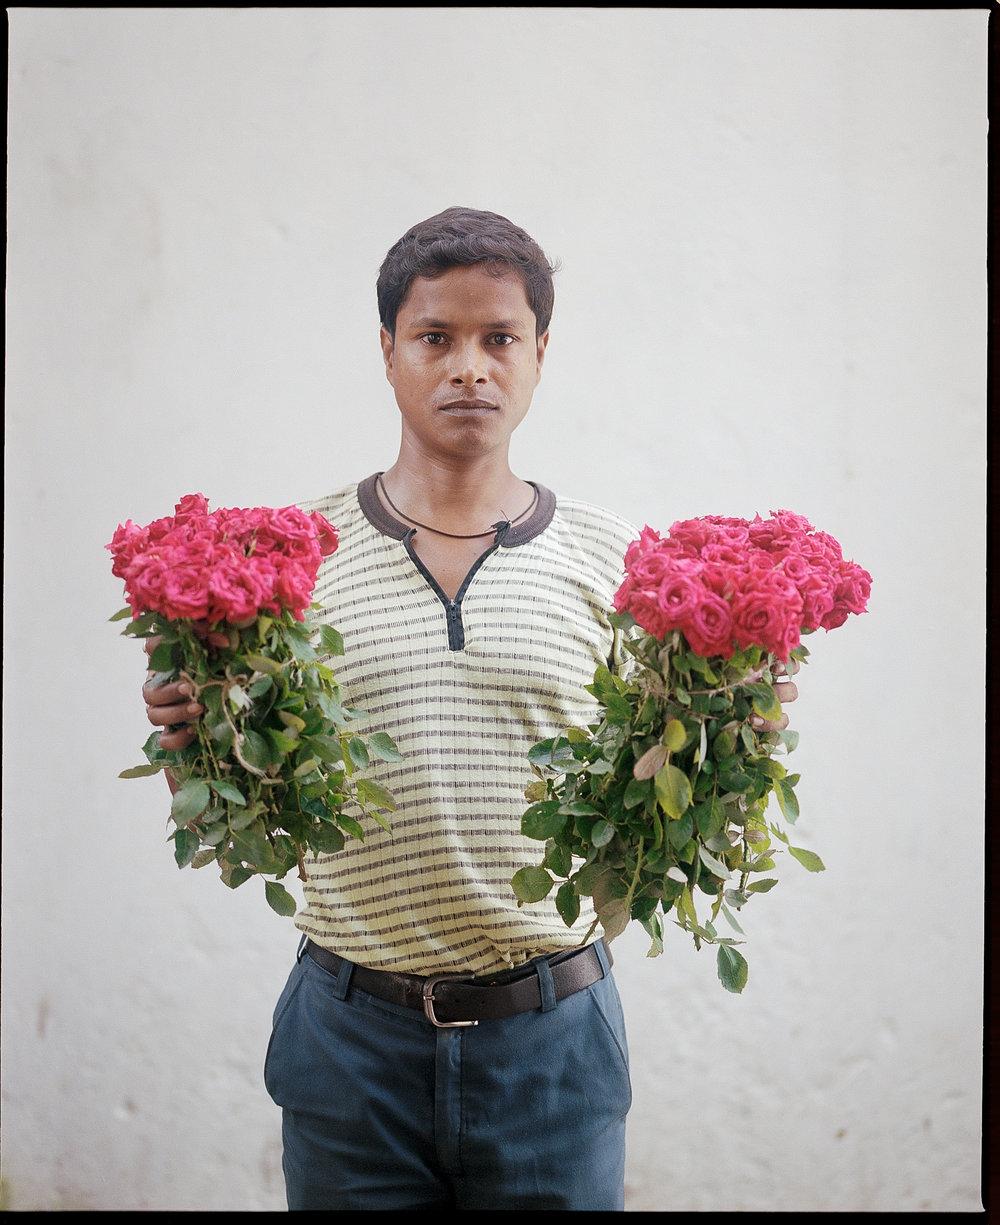 Kolkata_Flowers-26.jpg